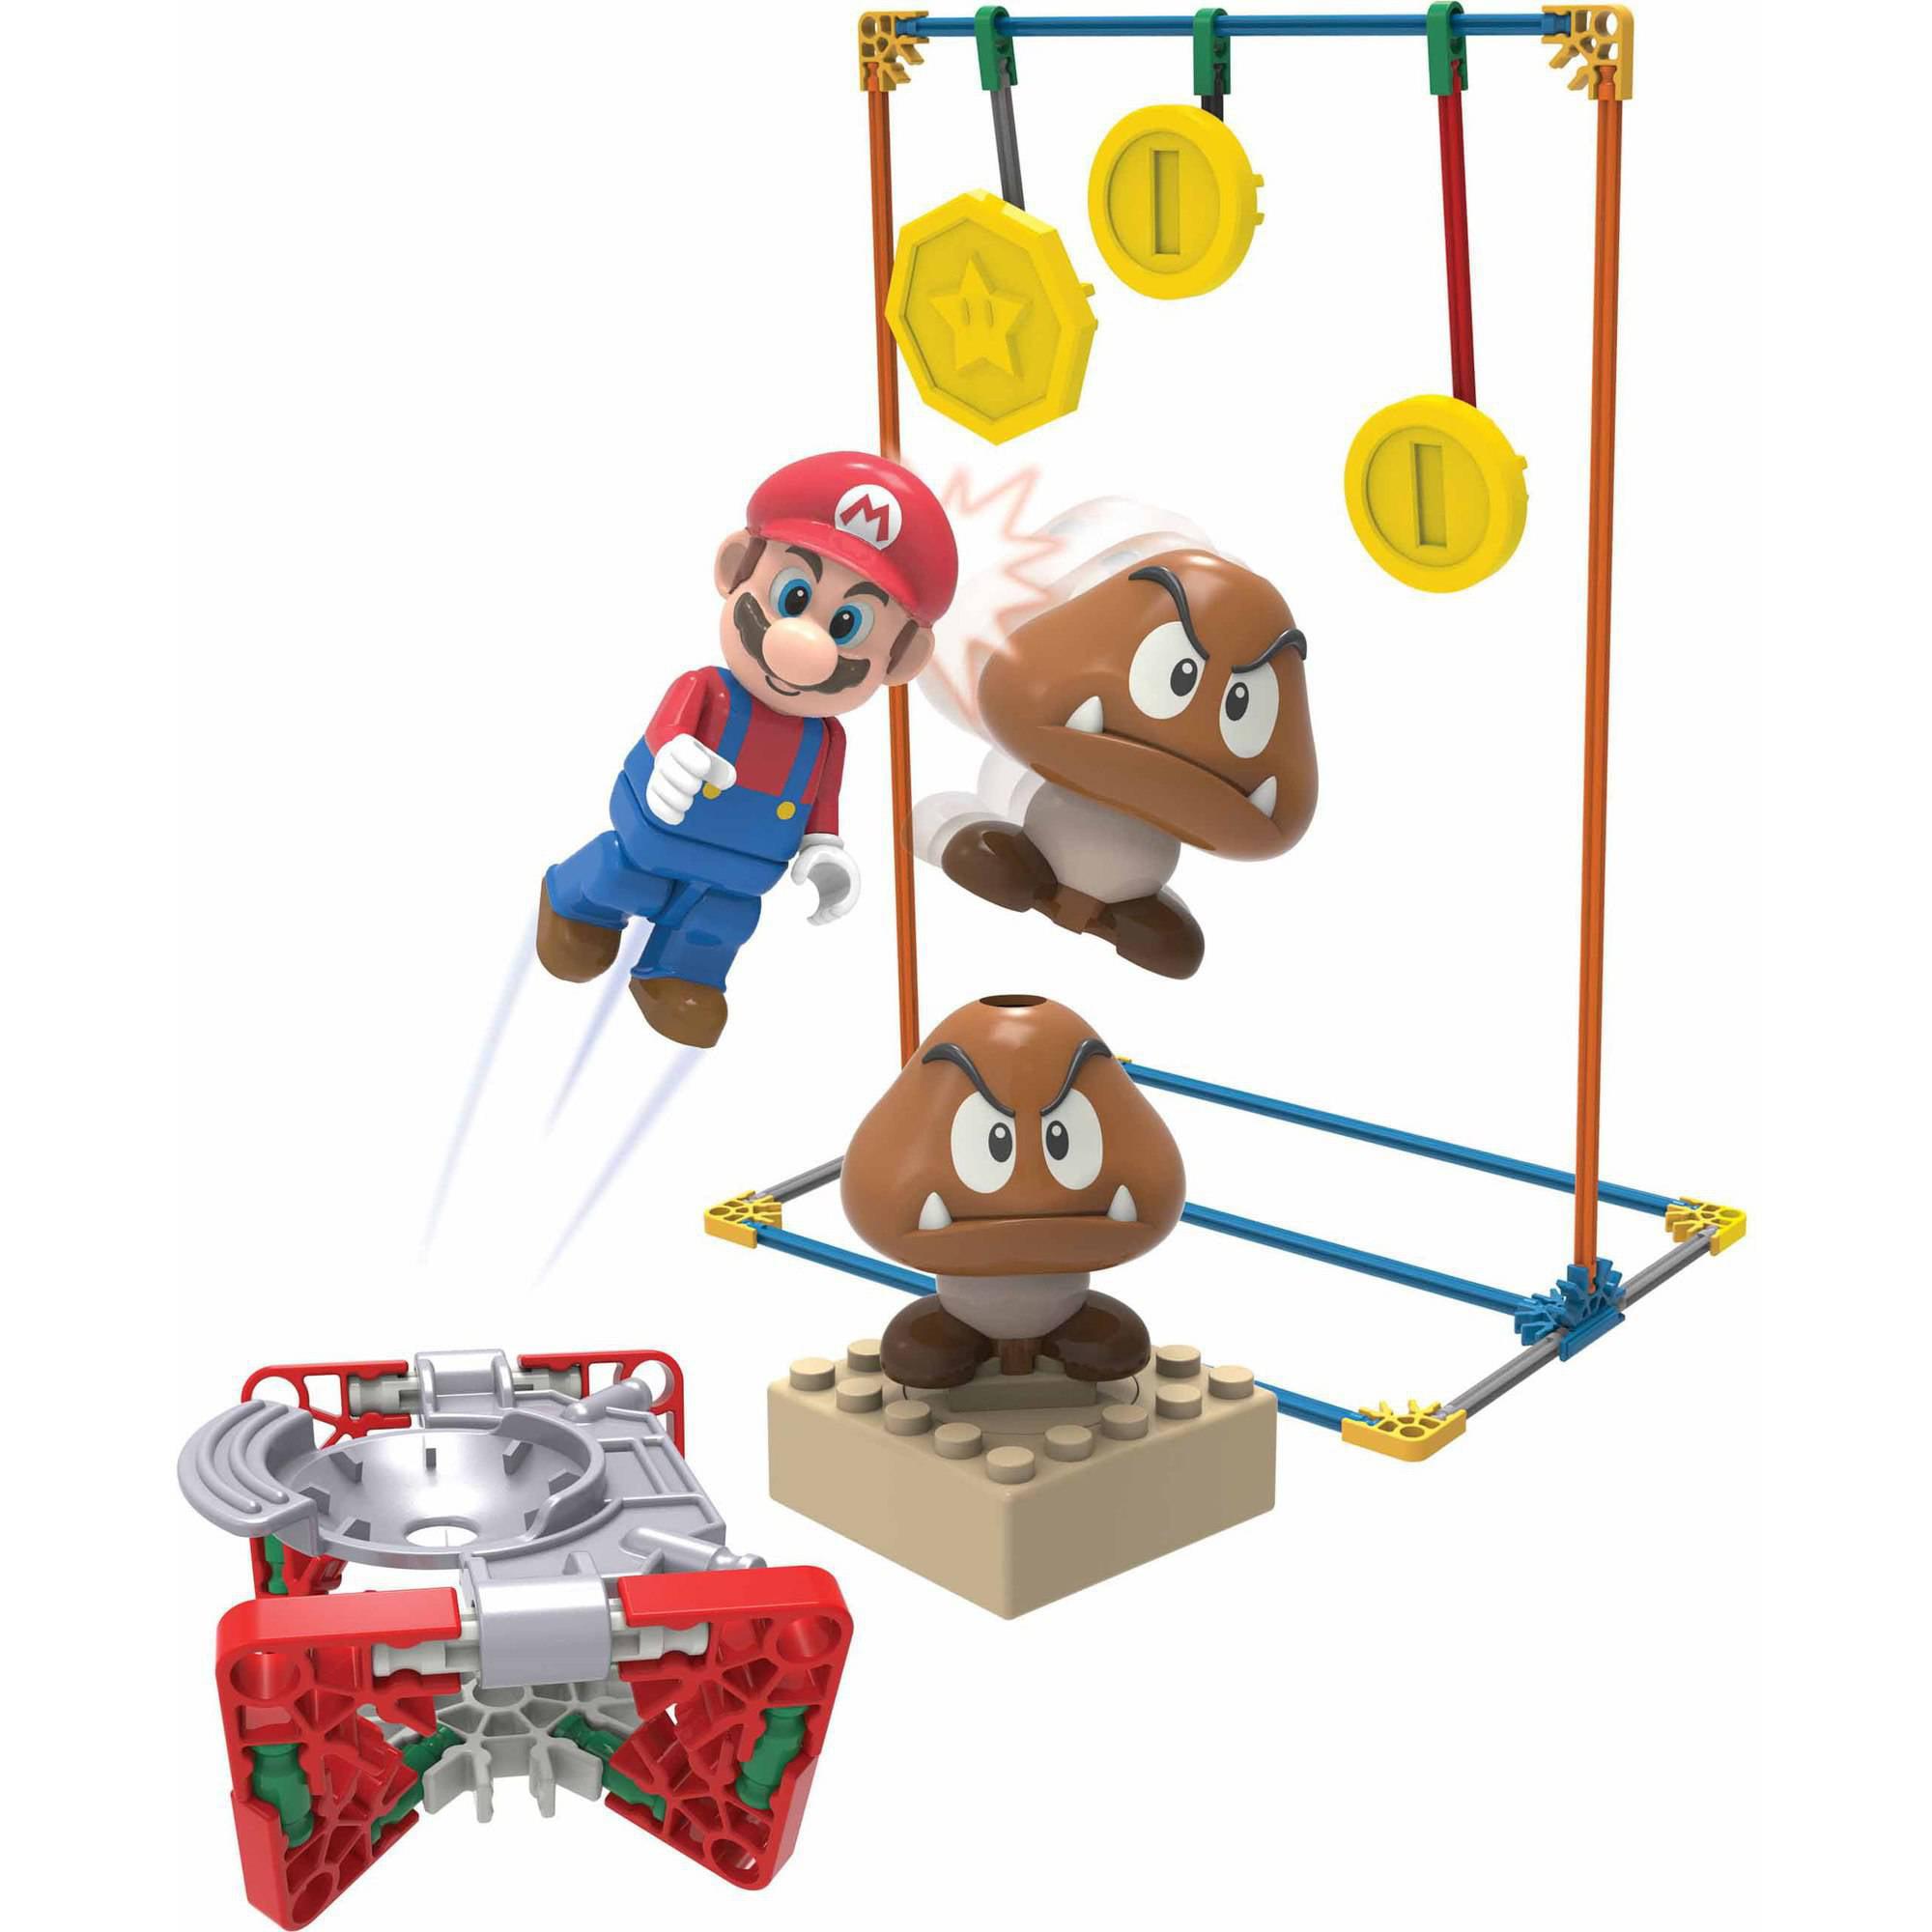 K'NEX Super Mario Stacked Goombas Building Set